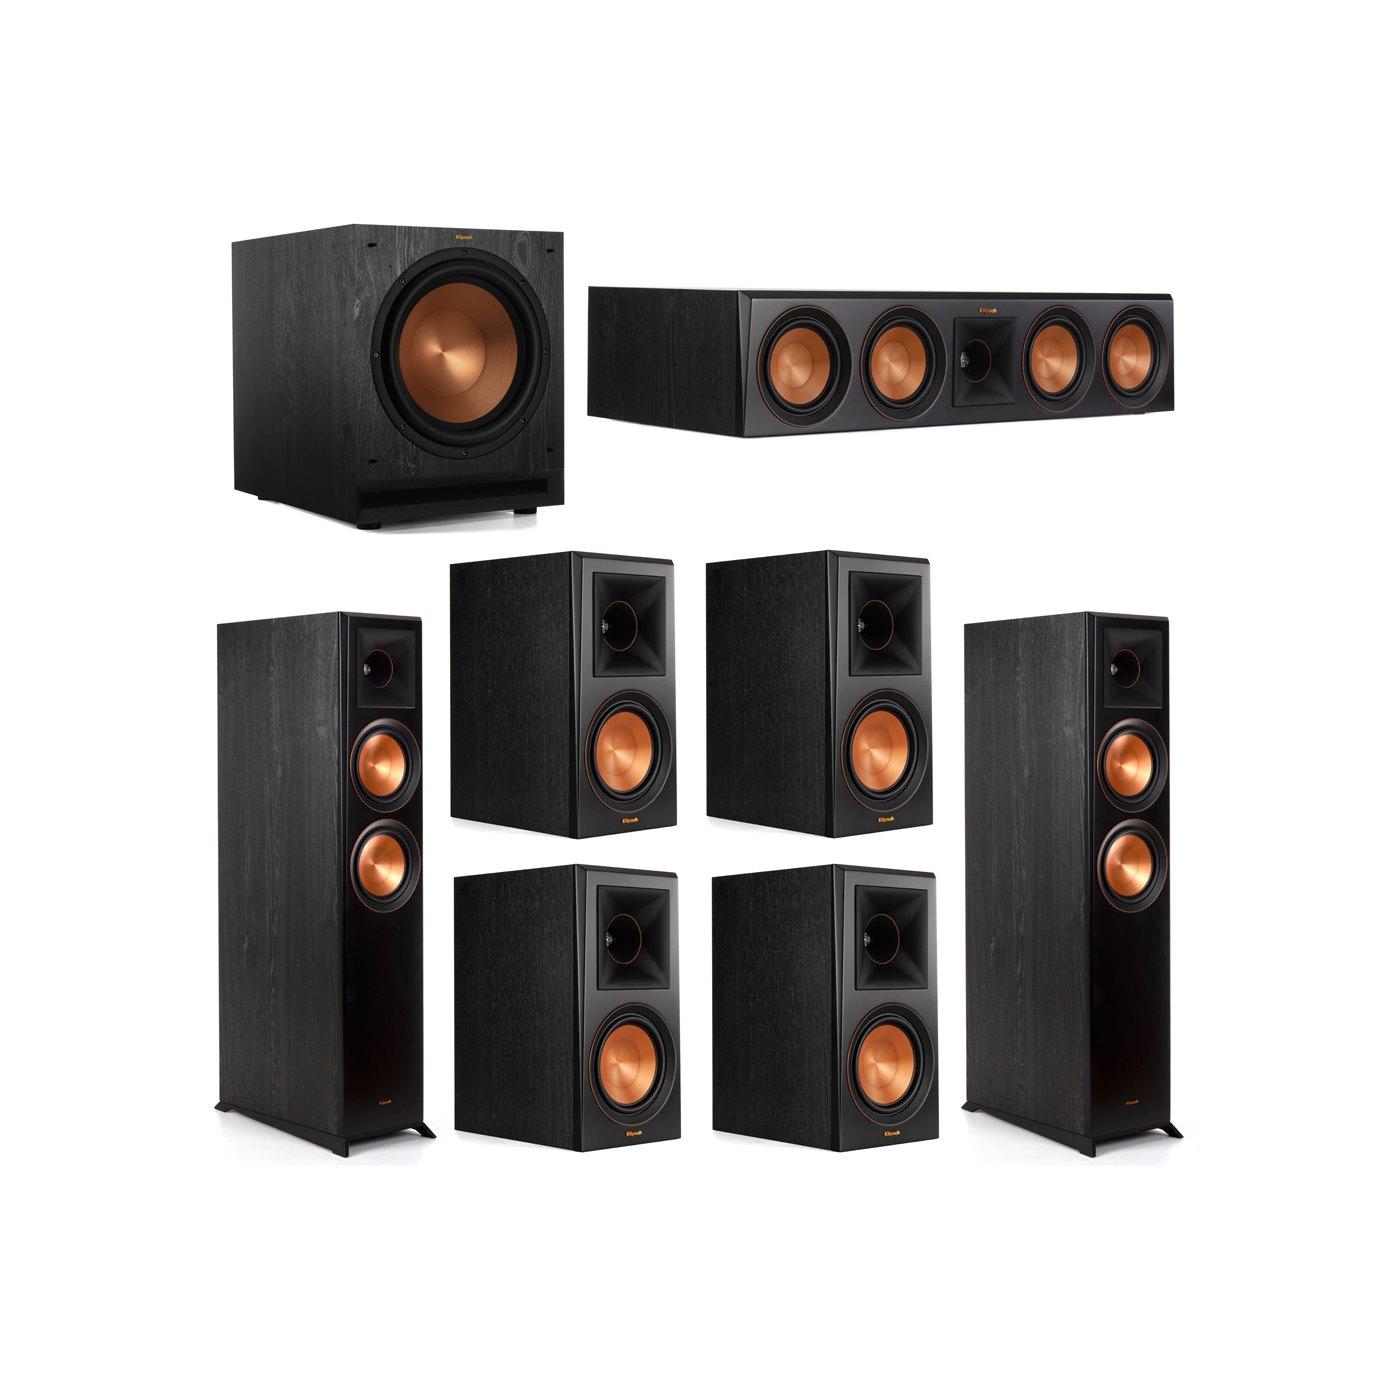 Klipsch 7.1 System with 2 RP-6000F Floorstanding Speakers, 1 Klipsch RP-504C Center Speaker, 4 Klipsch RP-600M Surround Speakers, 1 Klipsch SPL-120 Subwoofer